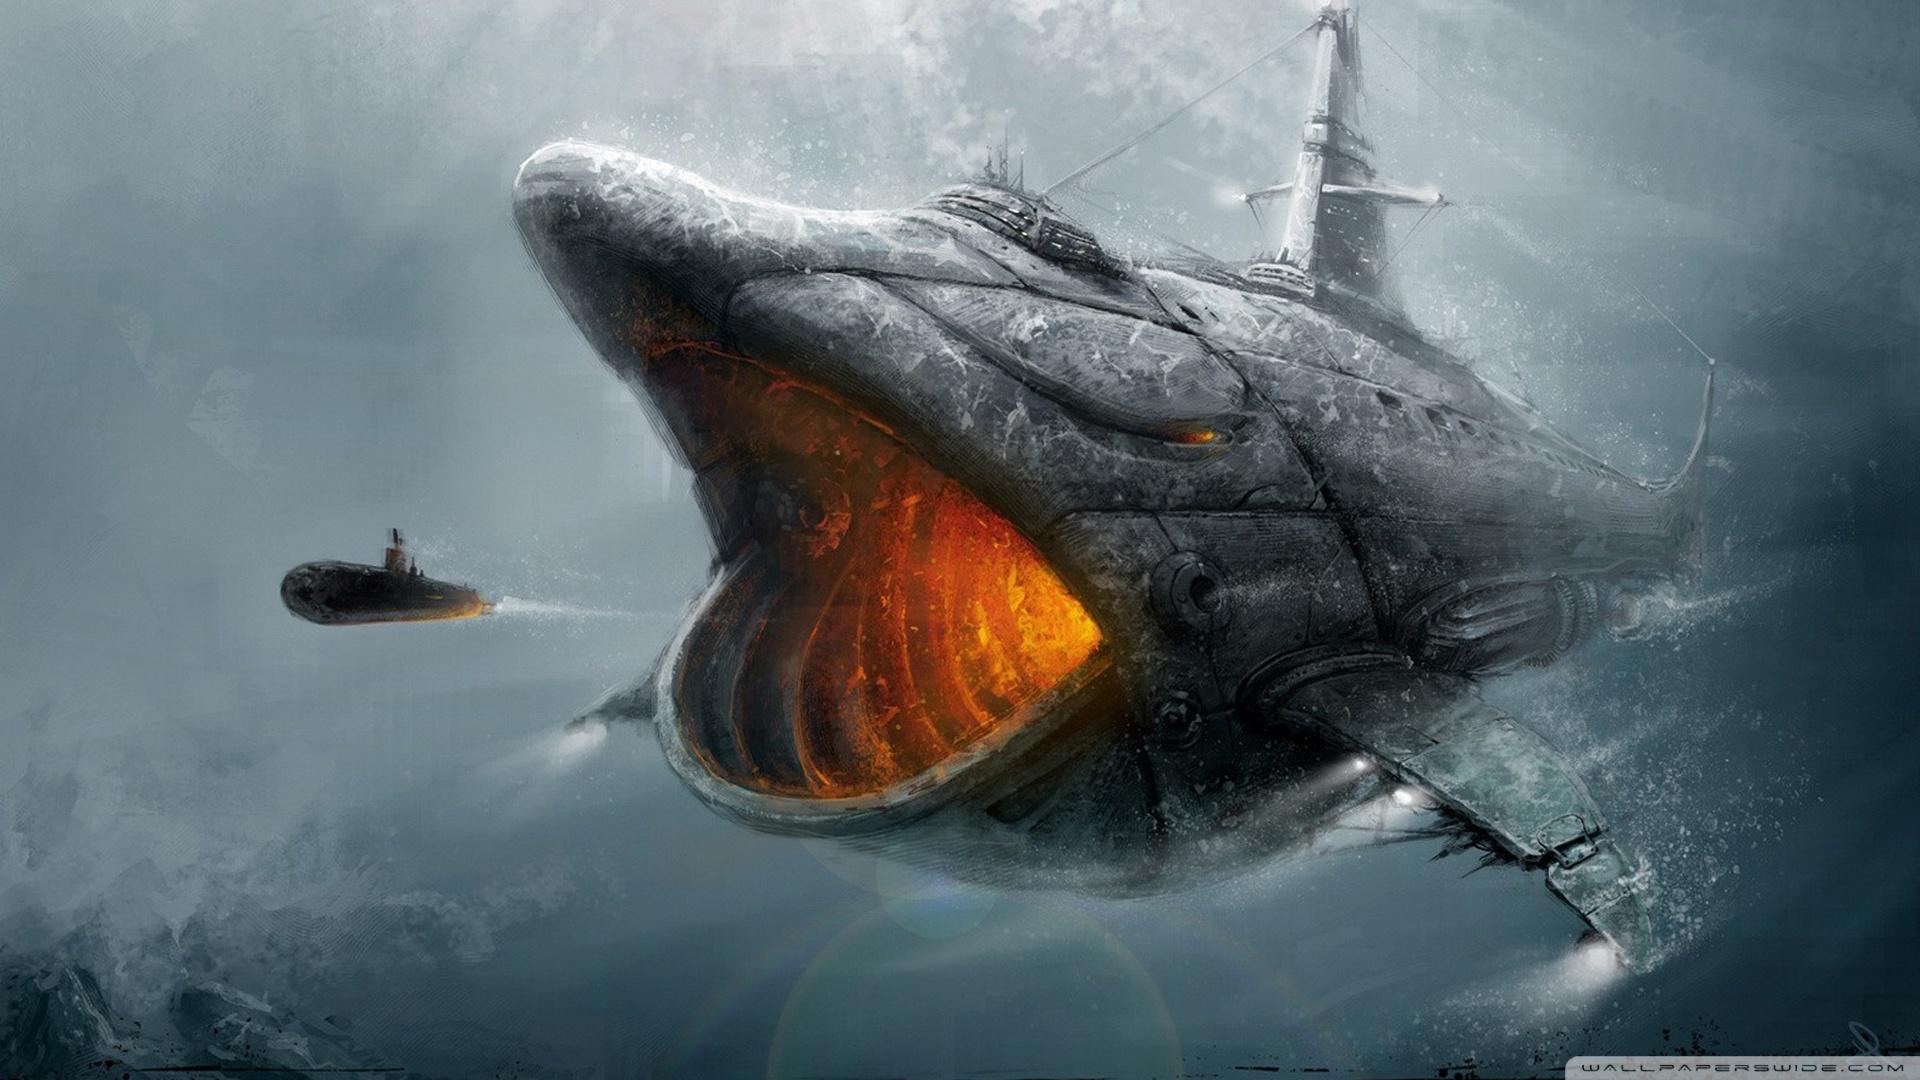 Fish Submarine Wallpaper 1920x1080 Fish Submarine 1920x1080